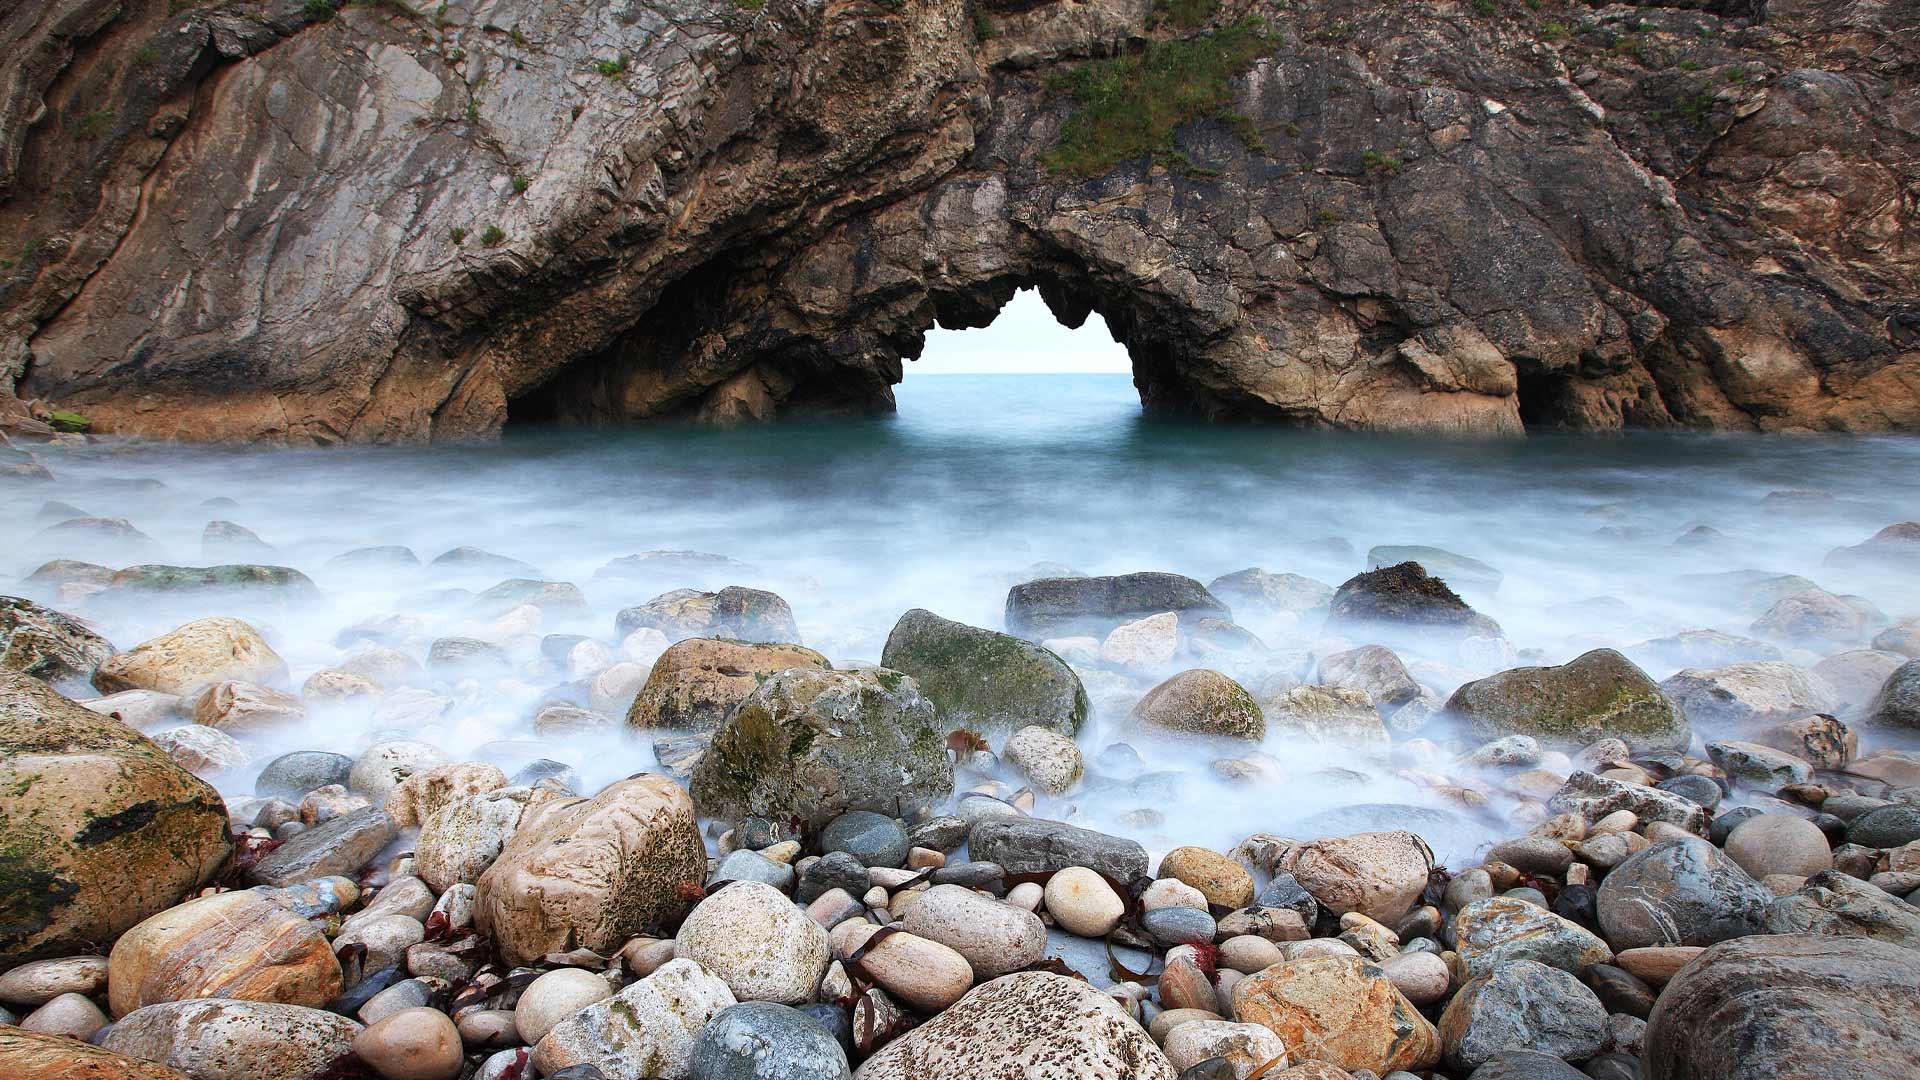 скалы арка камни море без регистрации